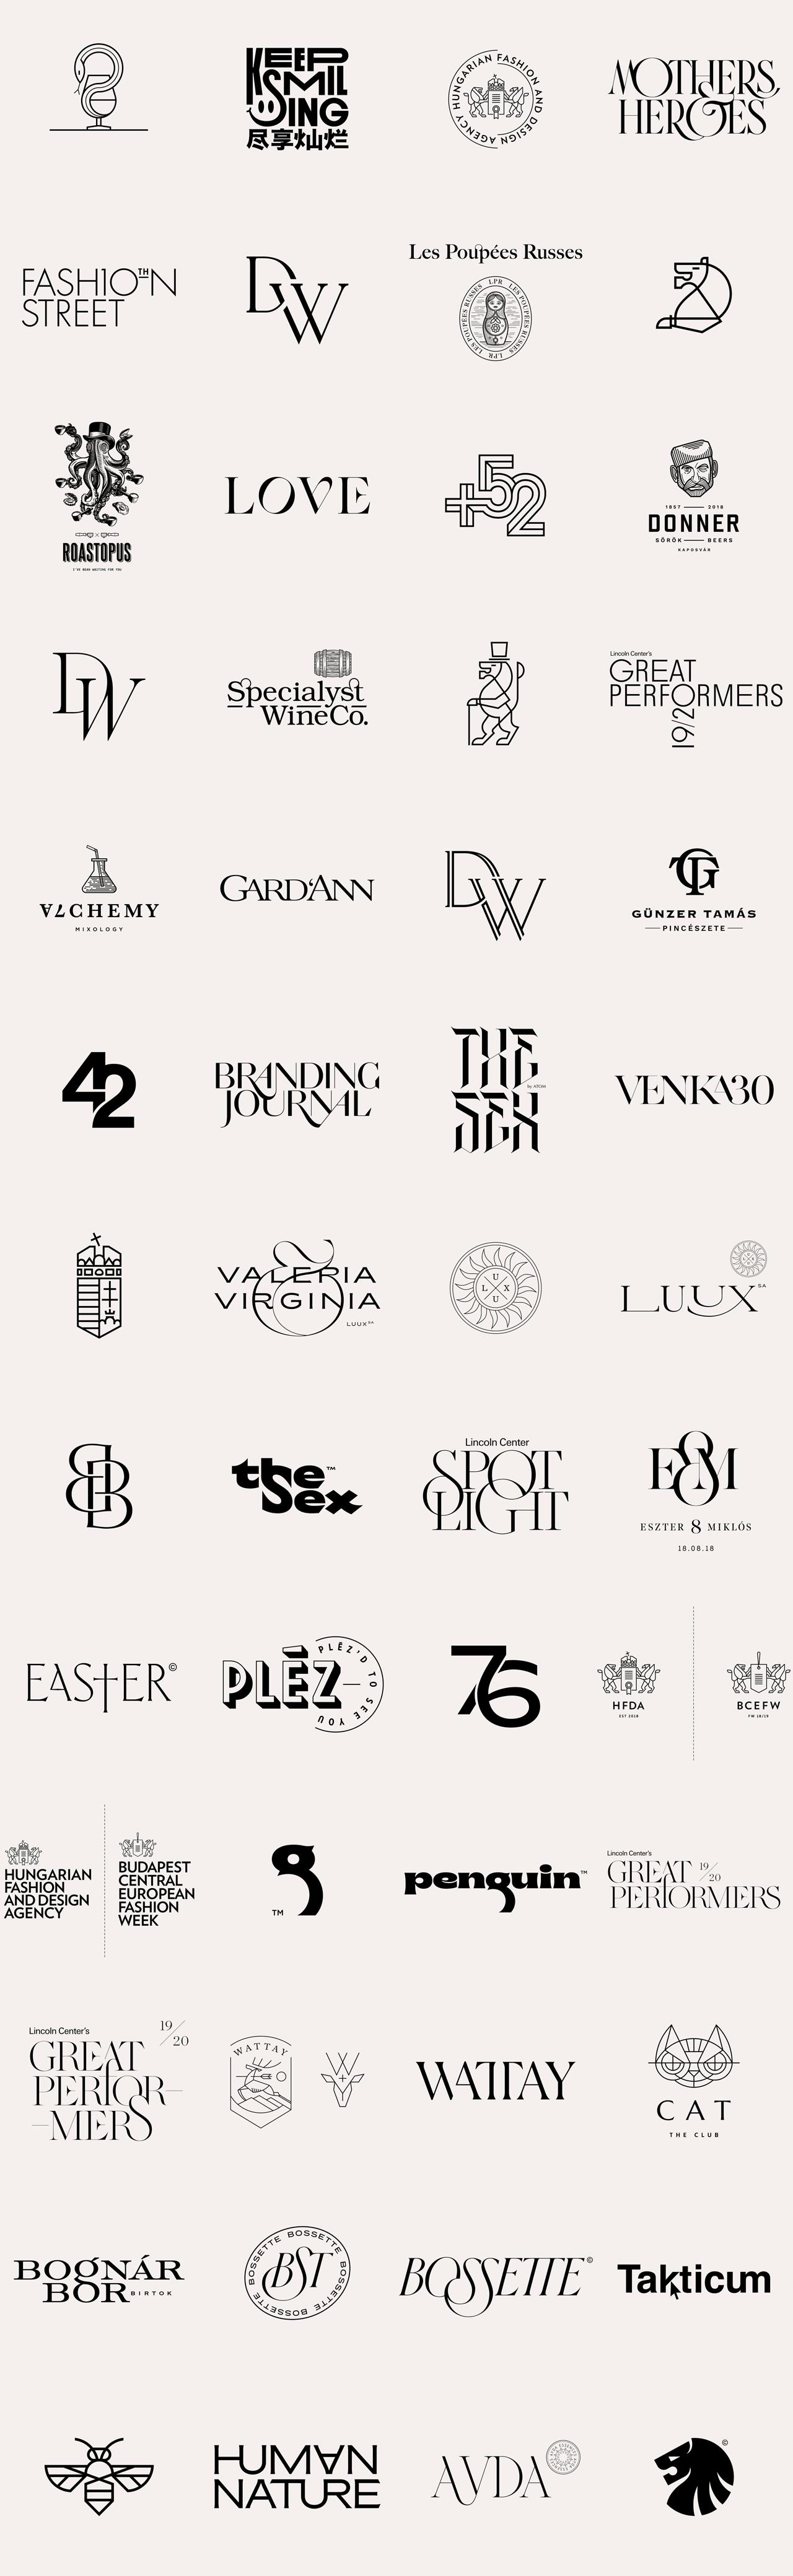 52 logos by graphic designer Miklós Kiss.